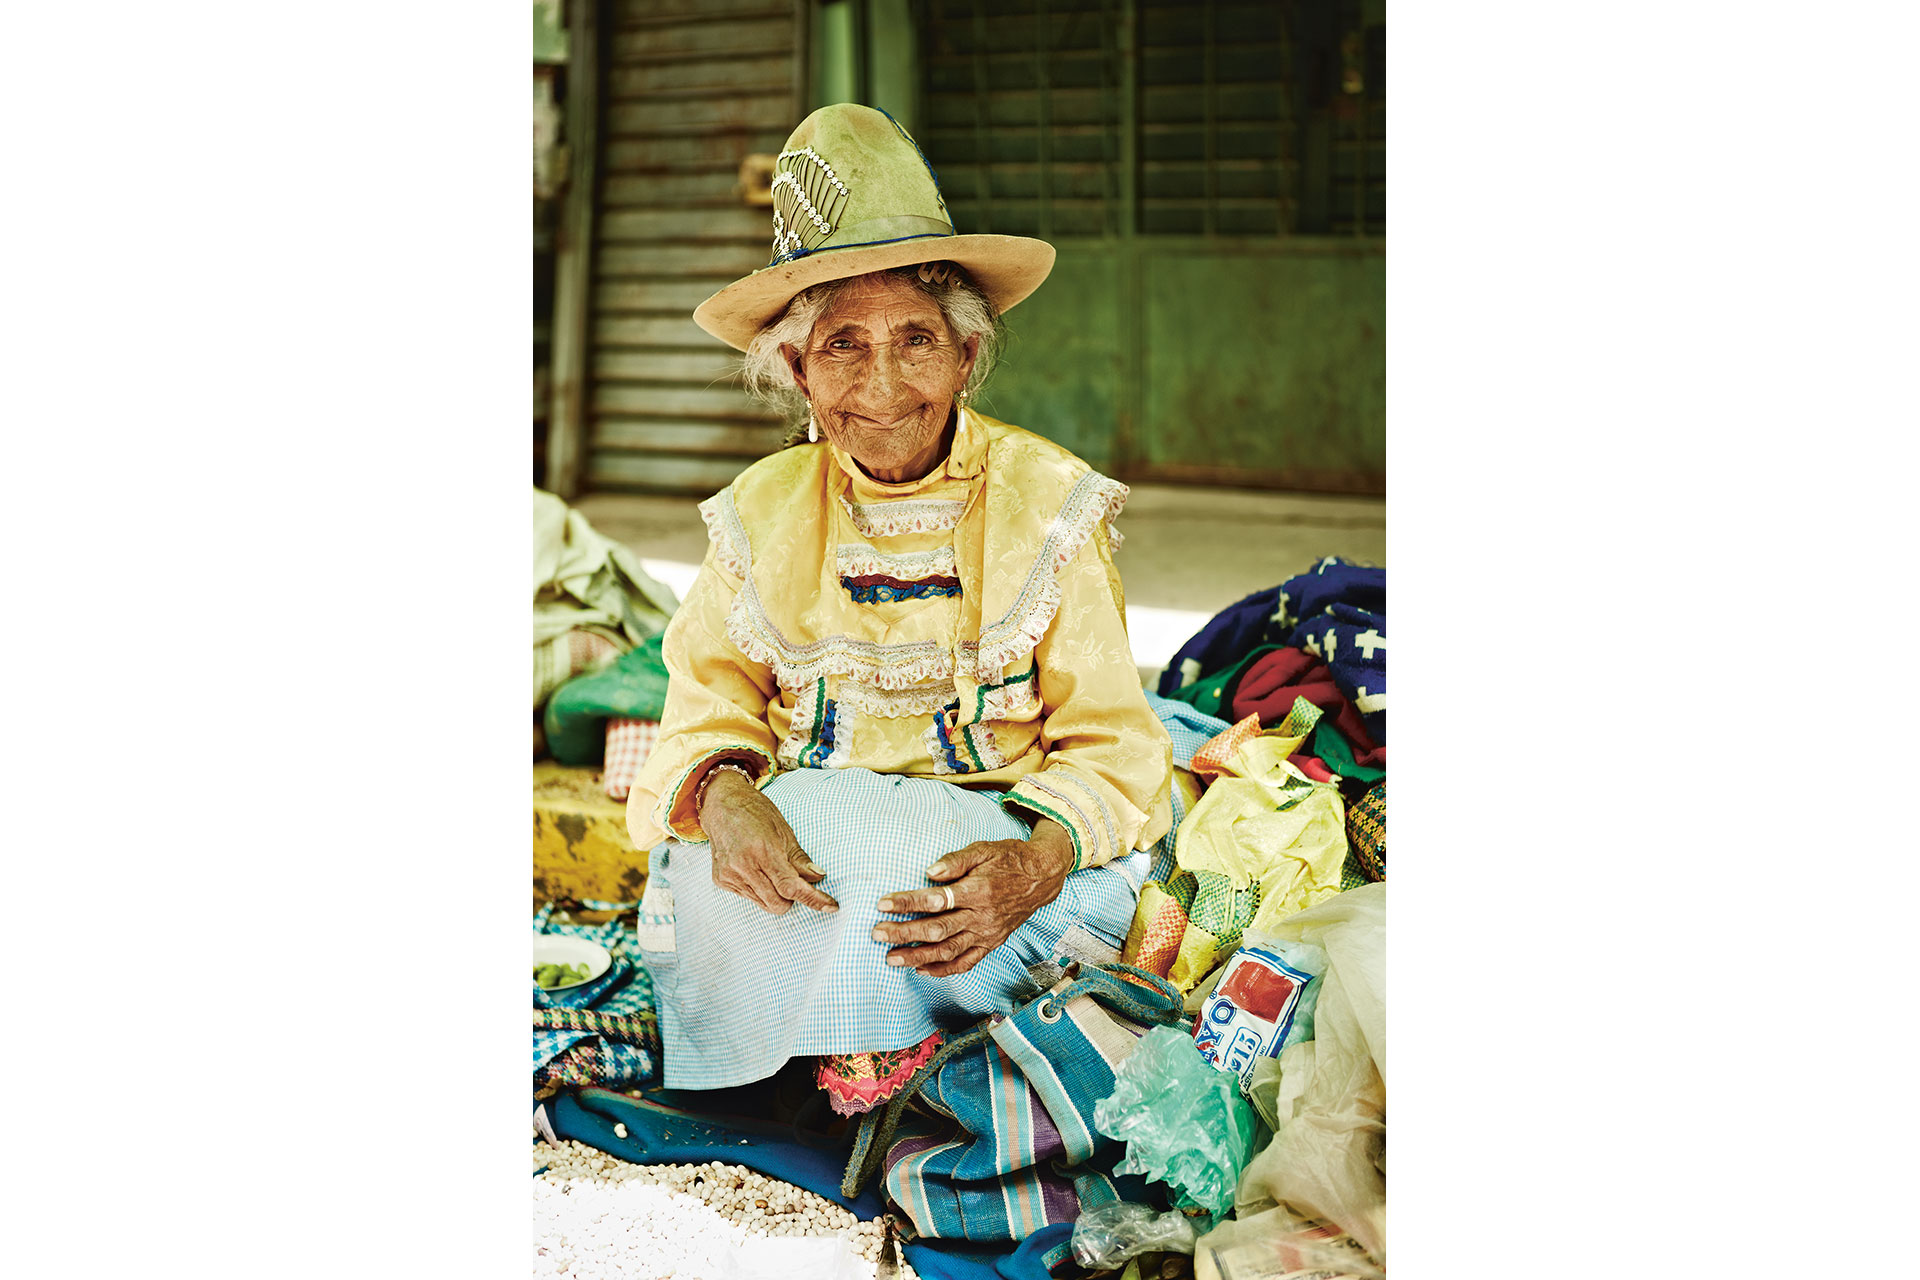 Reise Peru Portrait Maloja Katalog Travel München Fotograf